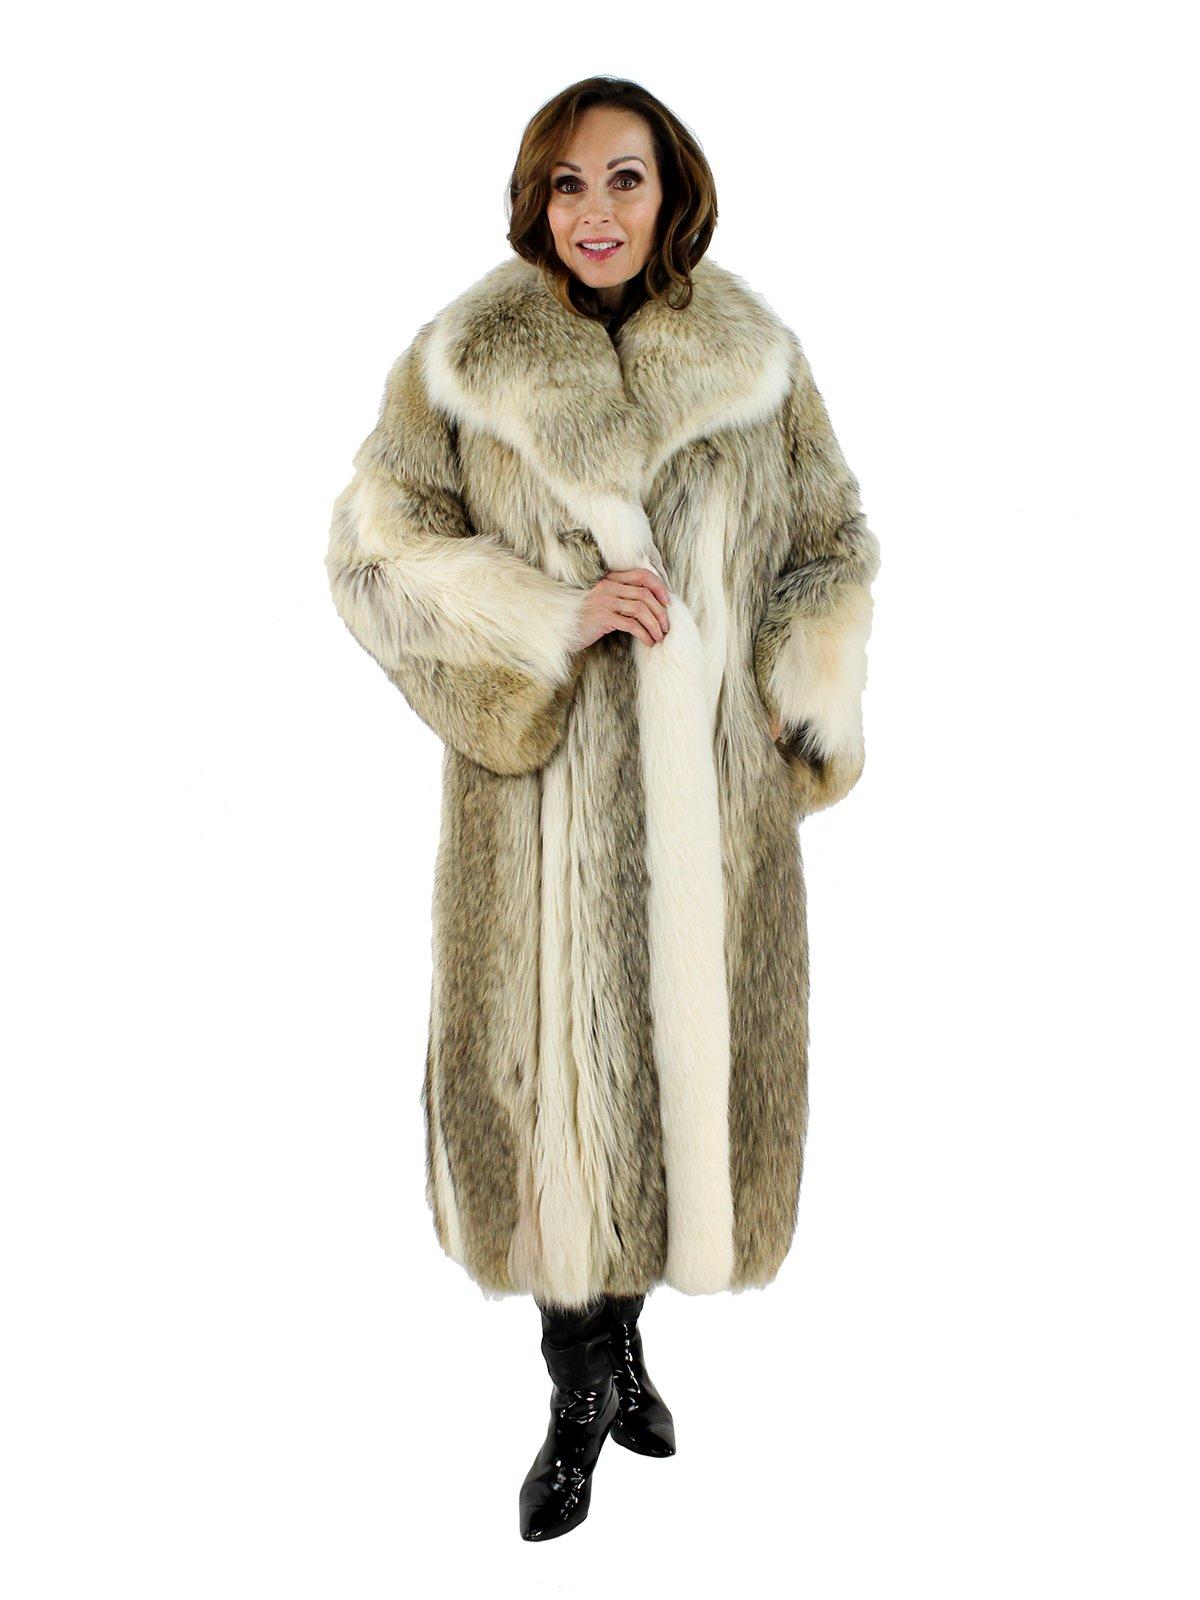 Coyote Fur Coat Womens Large Estate Furs >> Coyote Fur Coat W Shadow Fox Trim Women S Medium Estate Furs